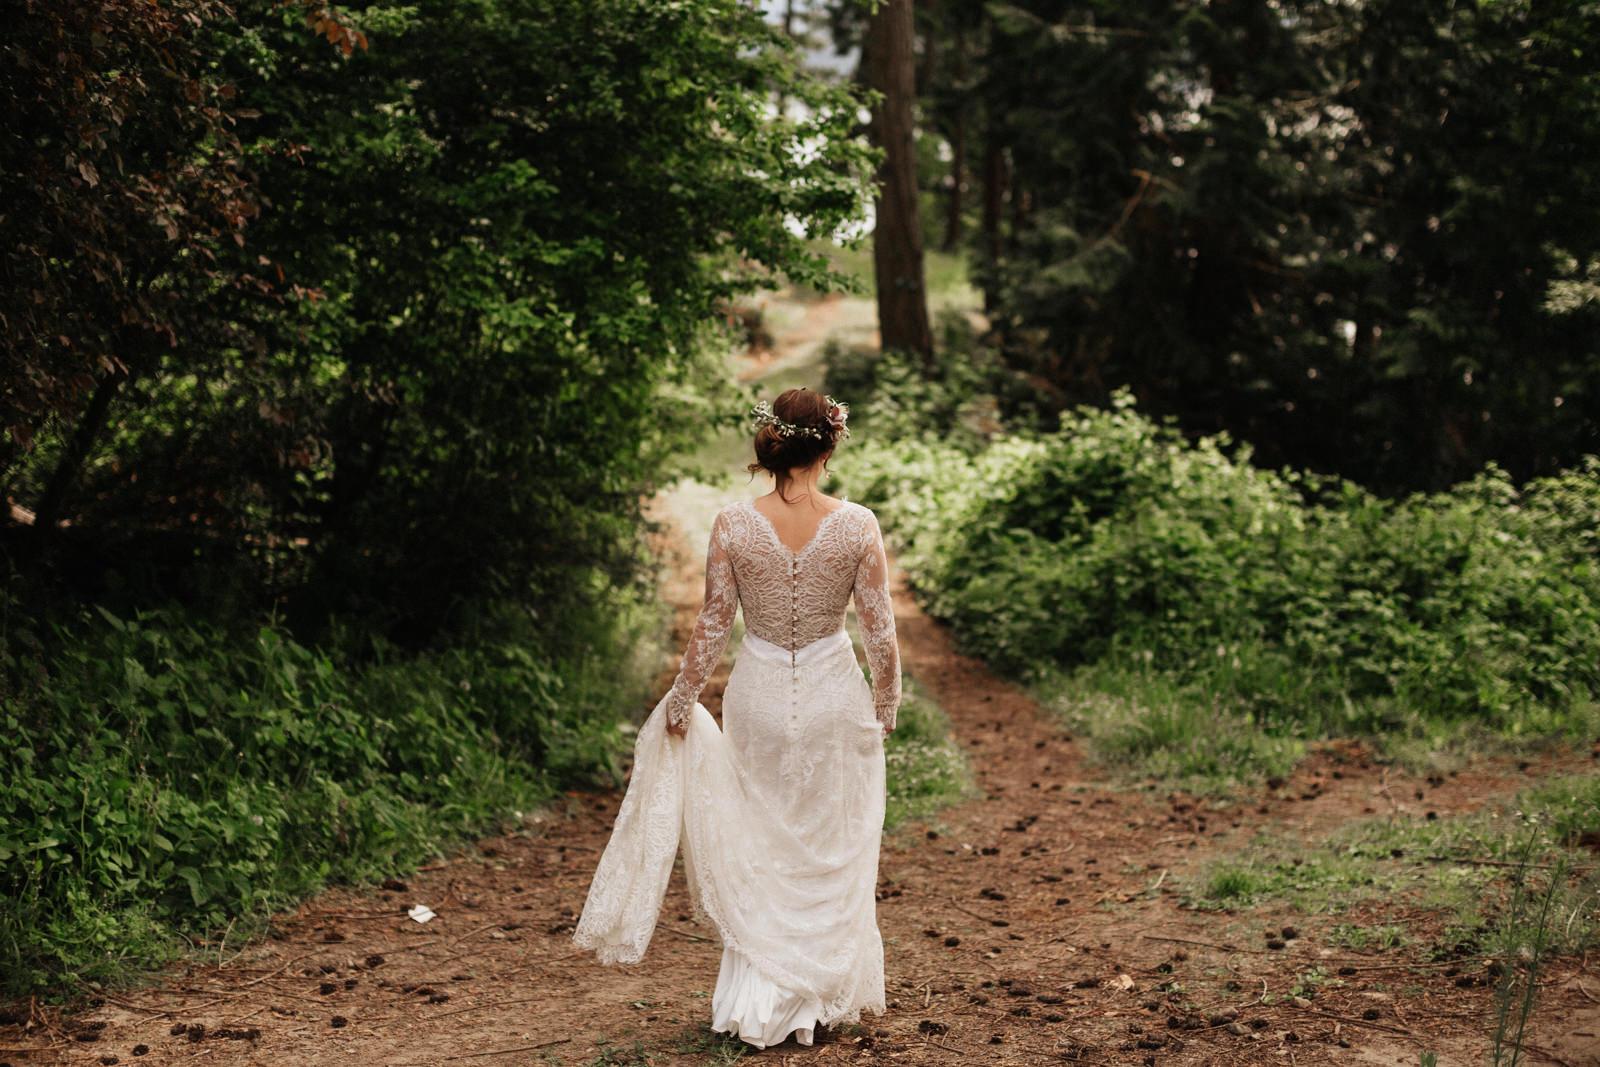 Bodega Ridge Galiano Island Wedding Photographer Kim Jay-34.jpg